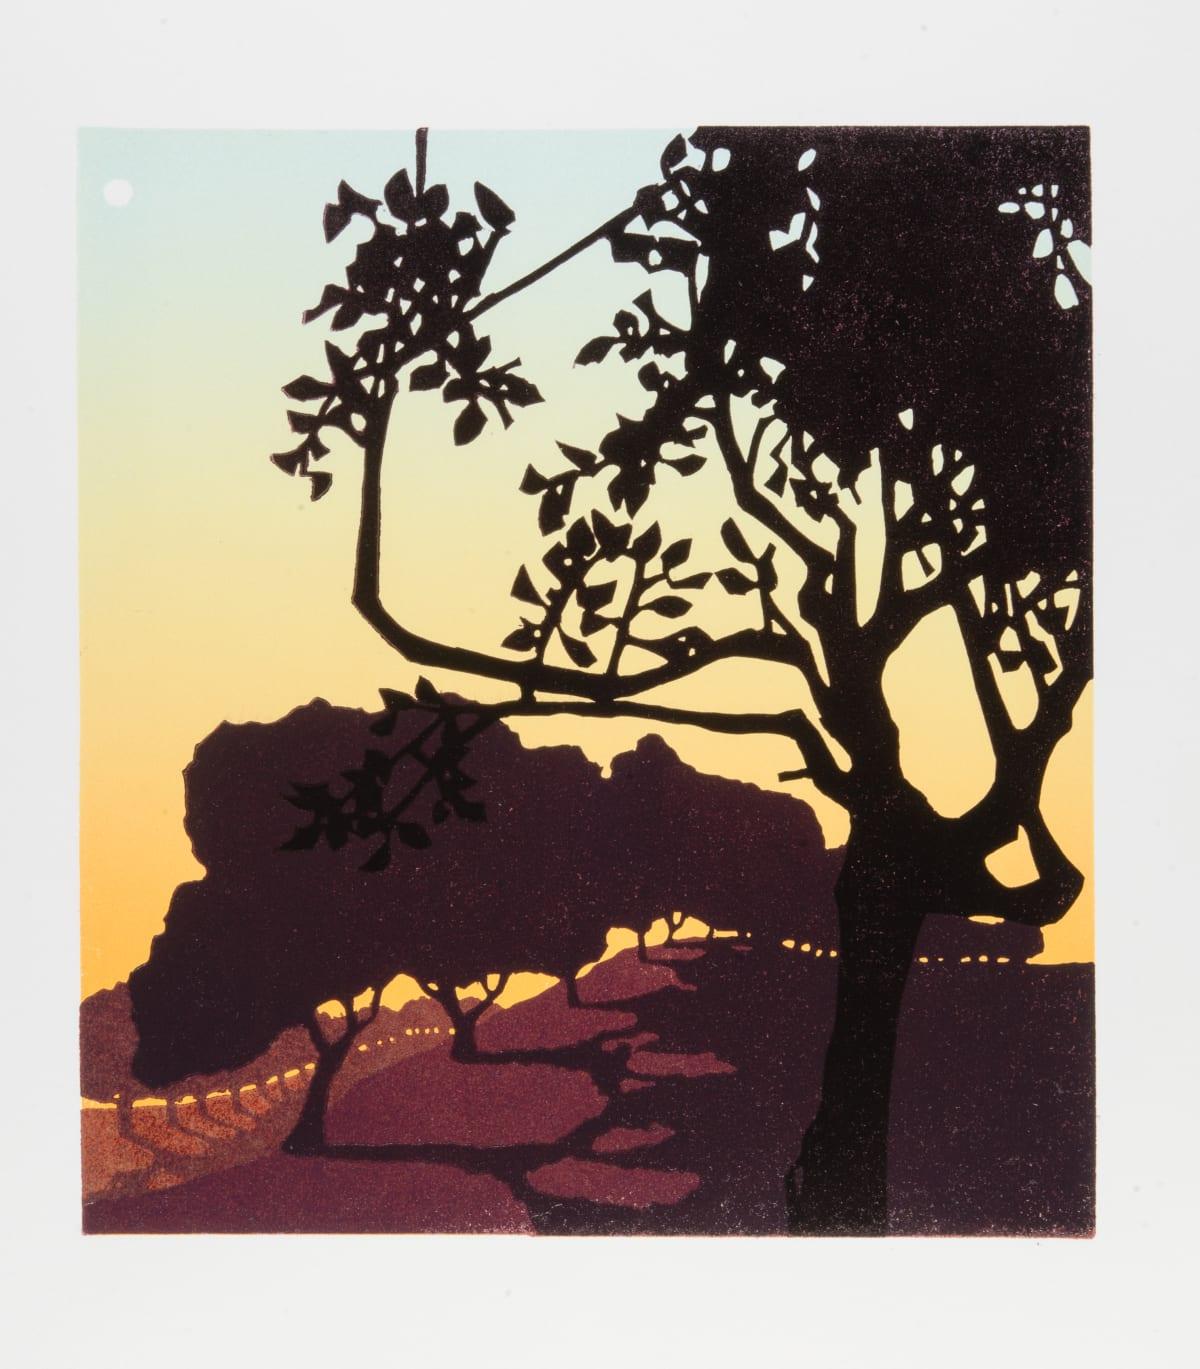 Laura Boswell Dawn Moon, 2018 Linocut 22 x 24 x 3 cm 8 5/8 x 9 1/2 x 1 1/8 in Edition 7 of 10